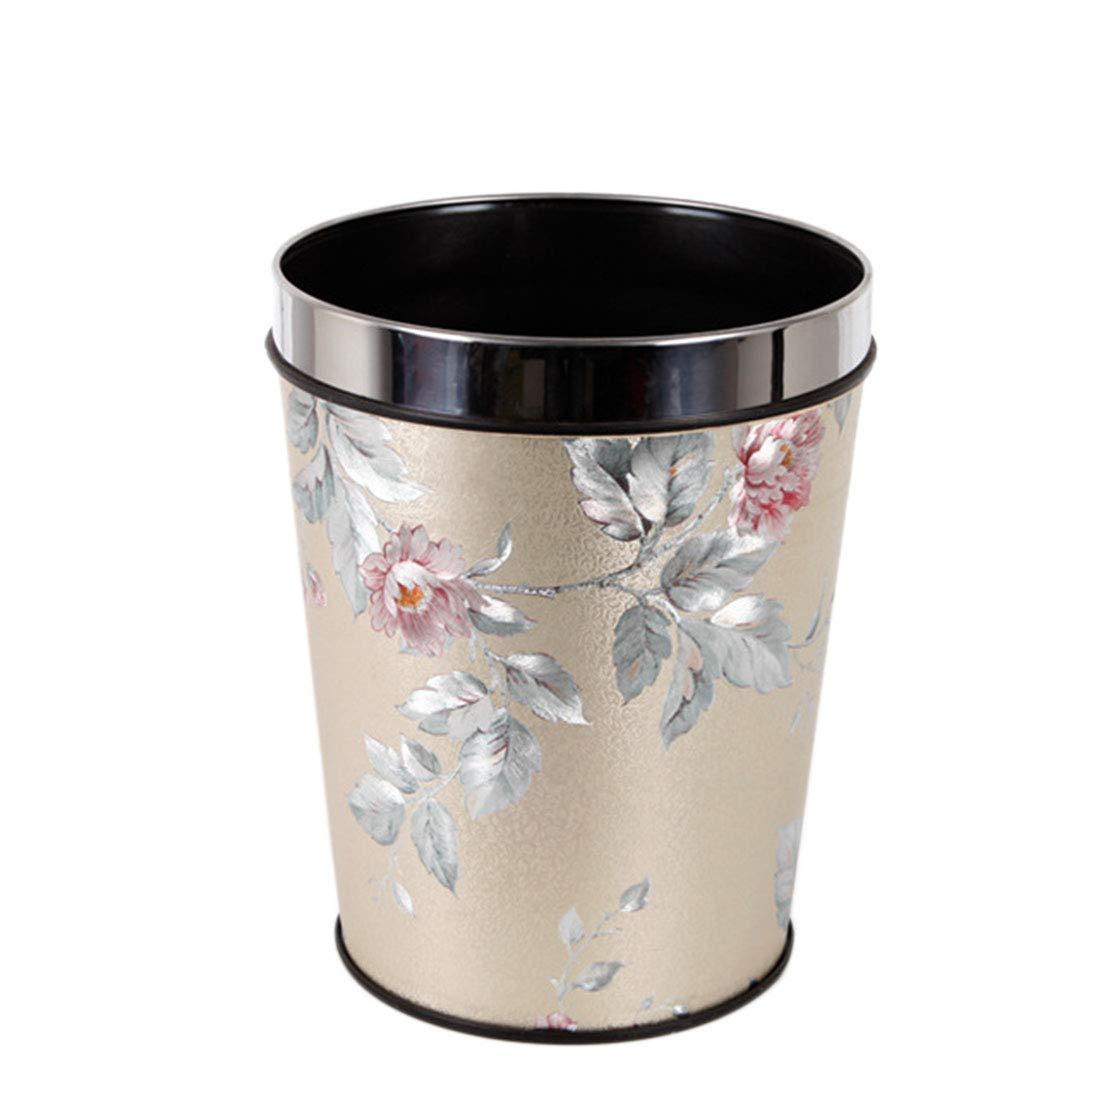 Gold Happy 12L Detach-A-Ring PP Trash Can Art Crafts Luxury Garbage Bin Rubbish Box Hotel Home Office Waste Basket